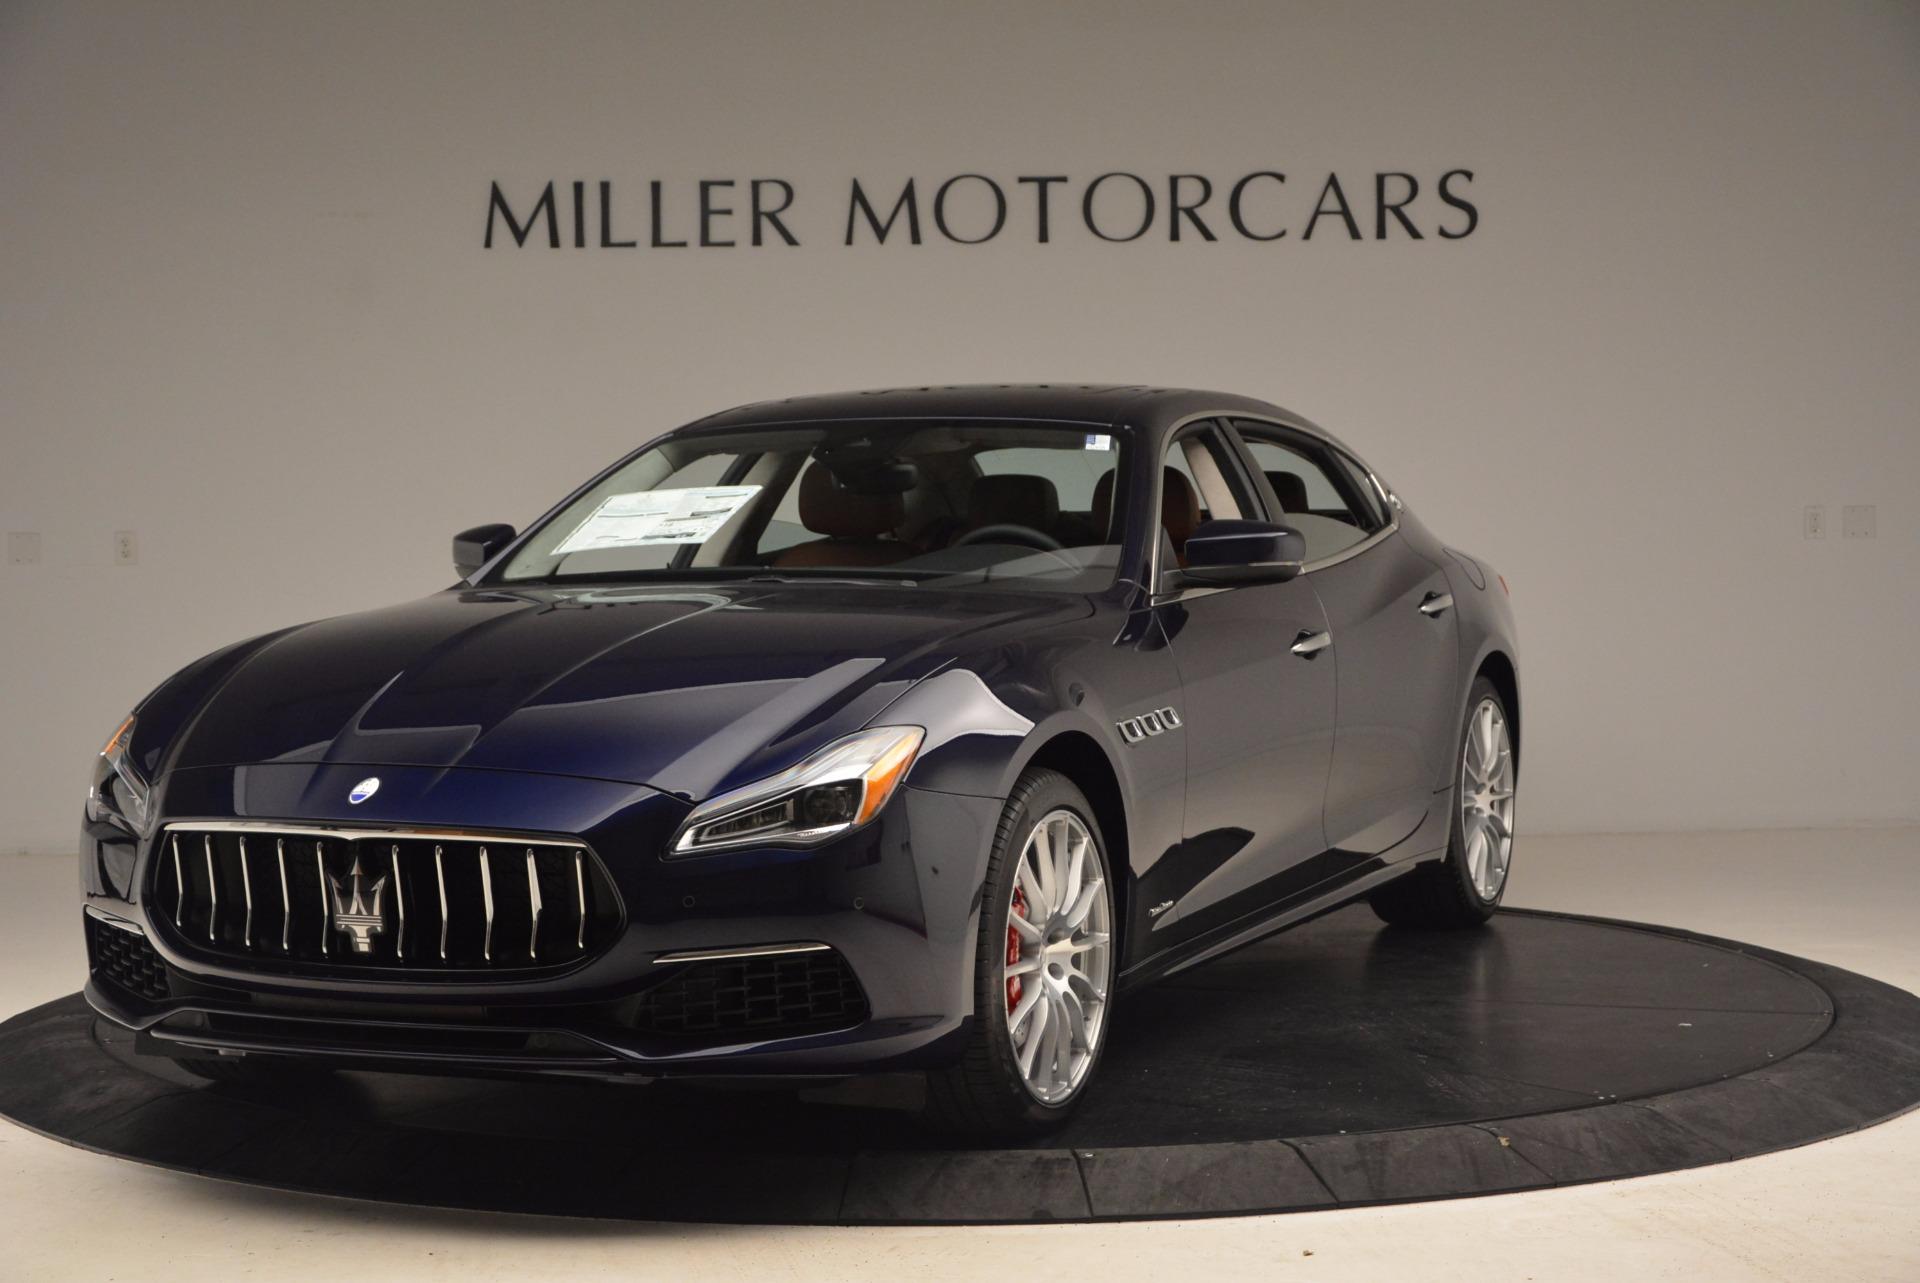 Used 2018 Maserati Quattroporte S Q4 GranLusso for sale Sold at McLaren Greenwich in Greenwich CT 06830 1